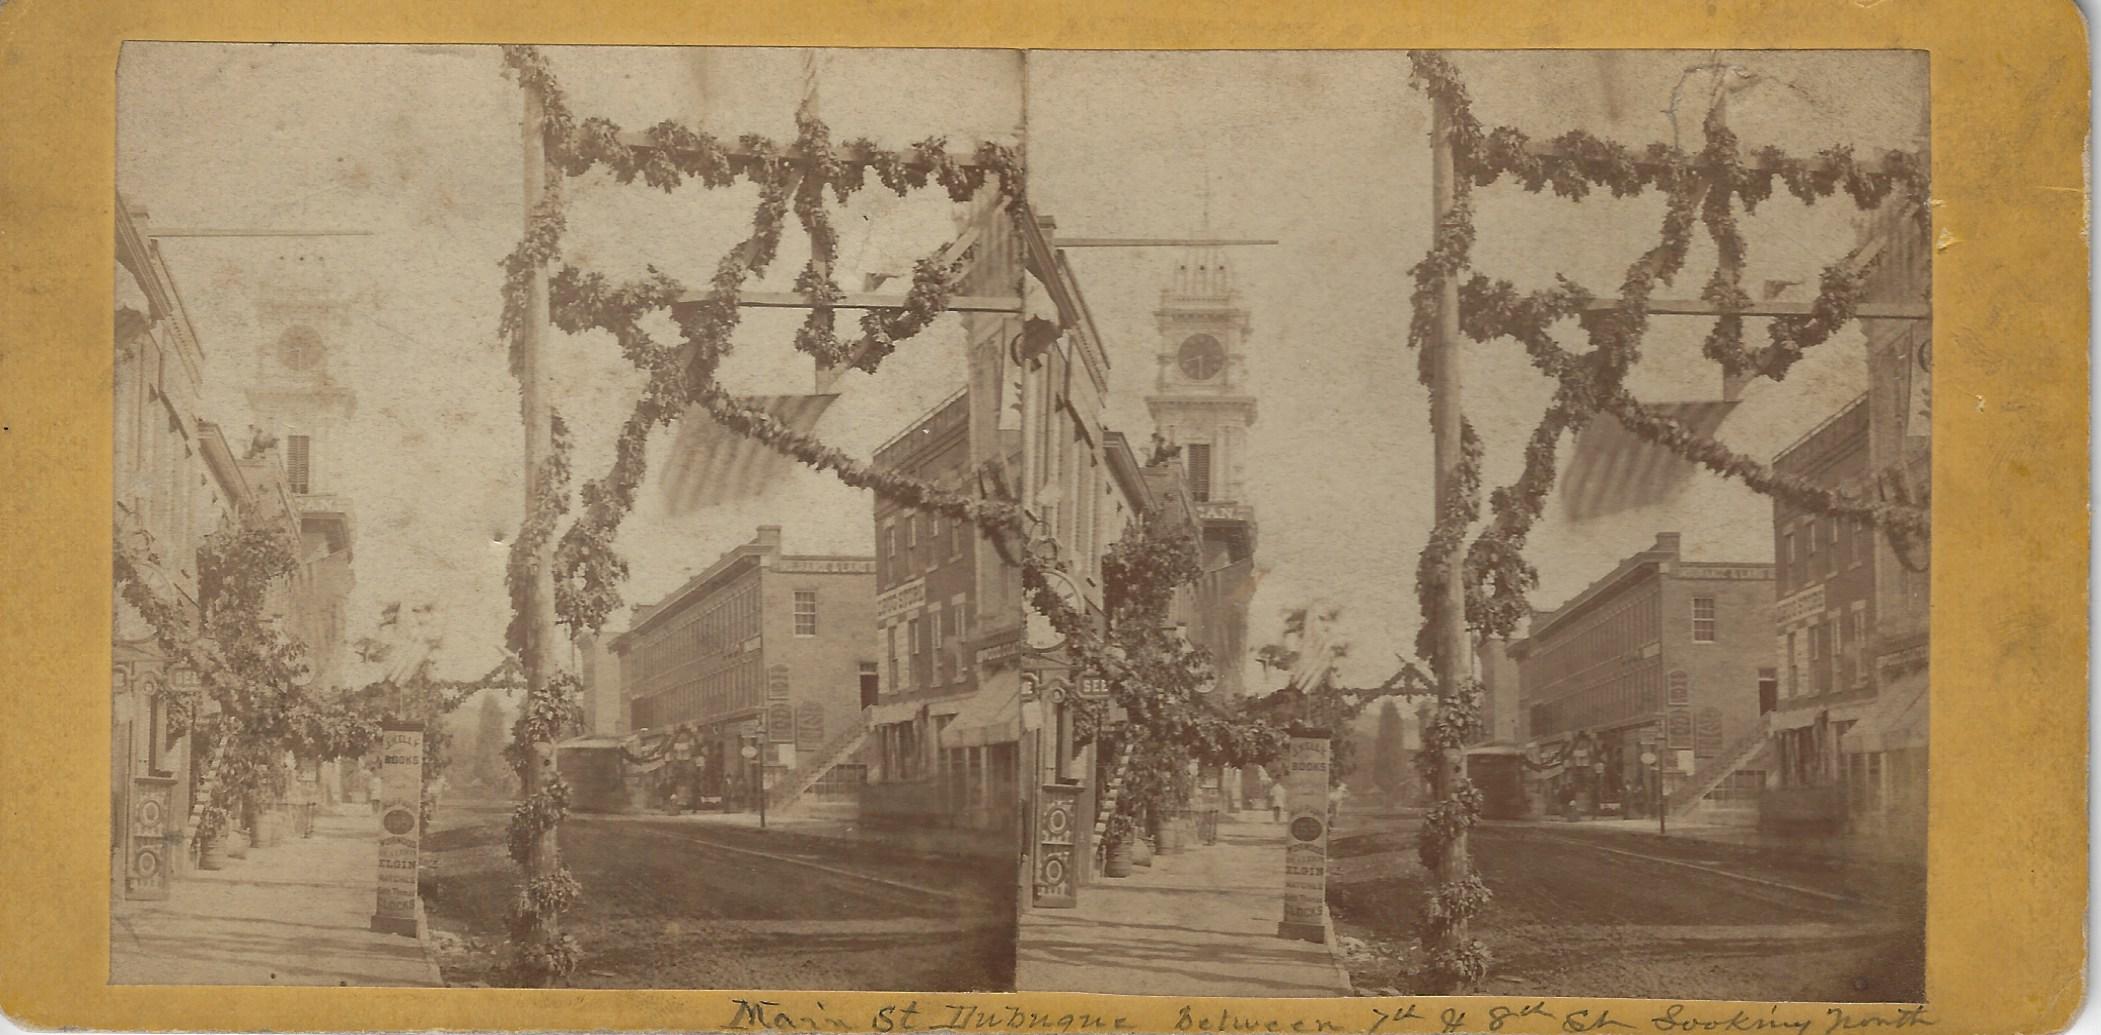 LJTP 100.246 - S. Root - New Town Clock - 1873